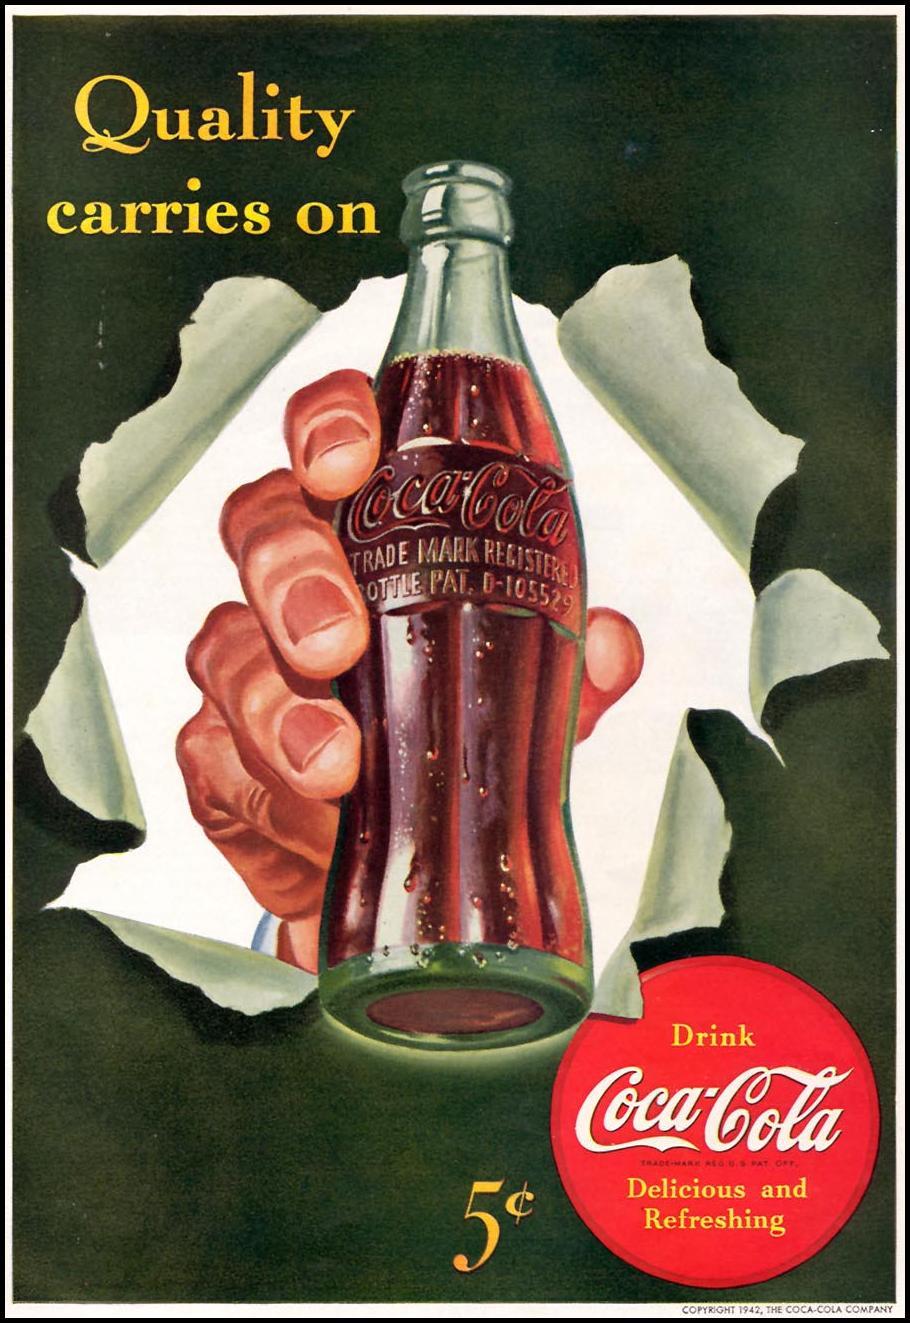 COCA-COLA TIME 06/15/1942 p. 57